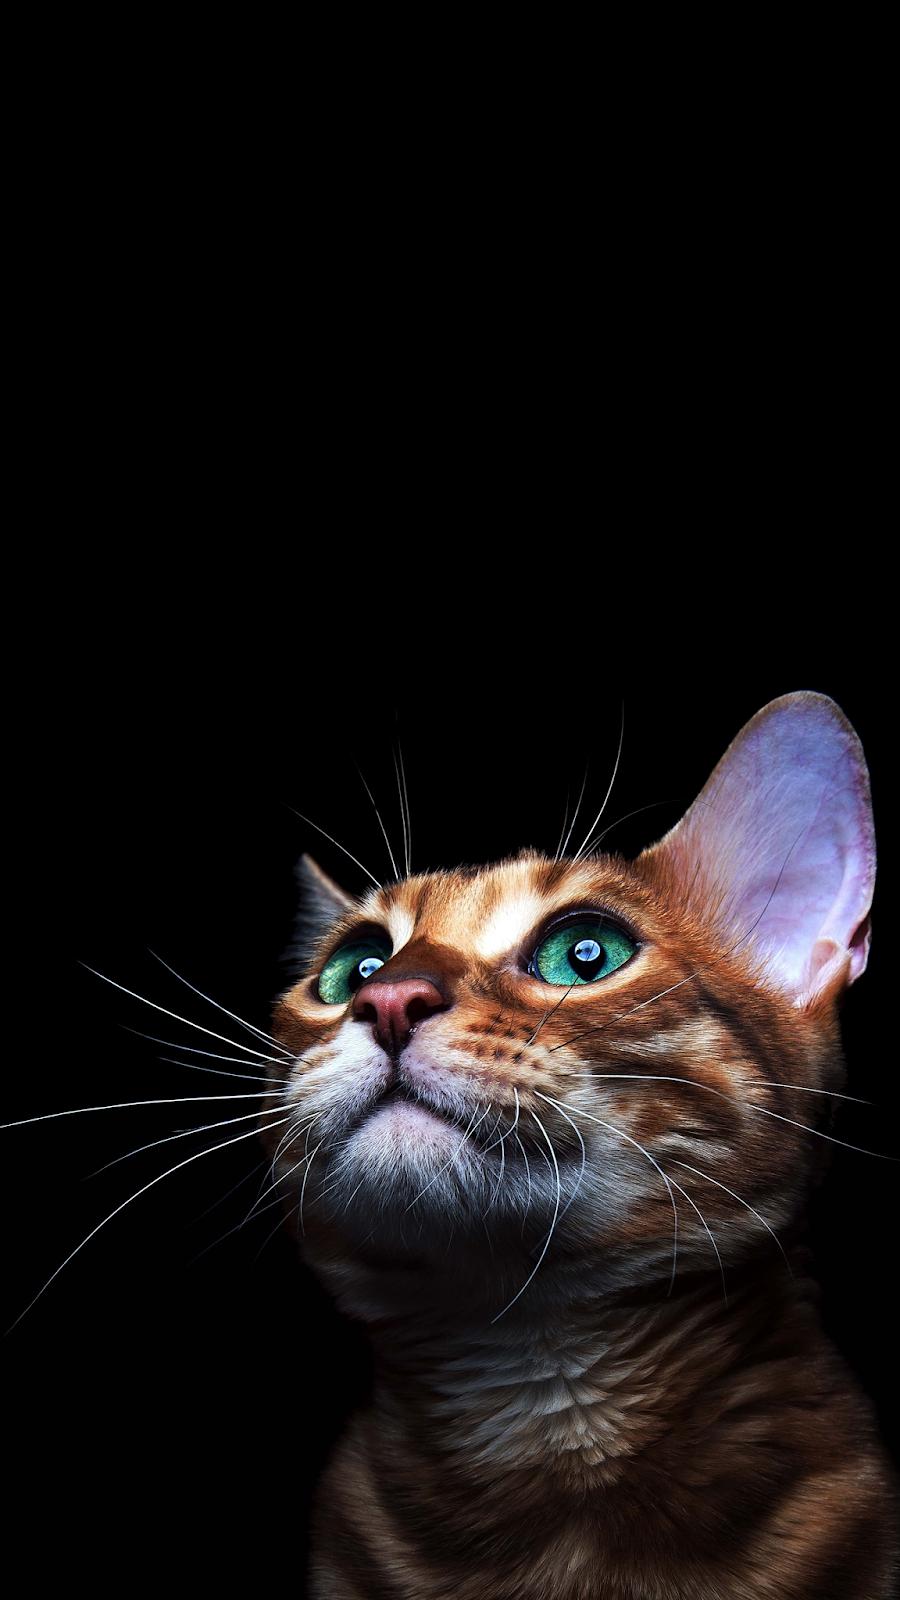 4K CAT AMOLED PHONE WALLPAPER